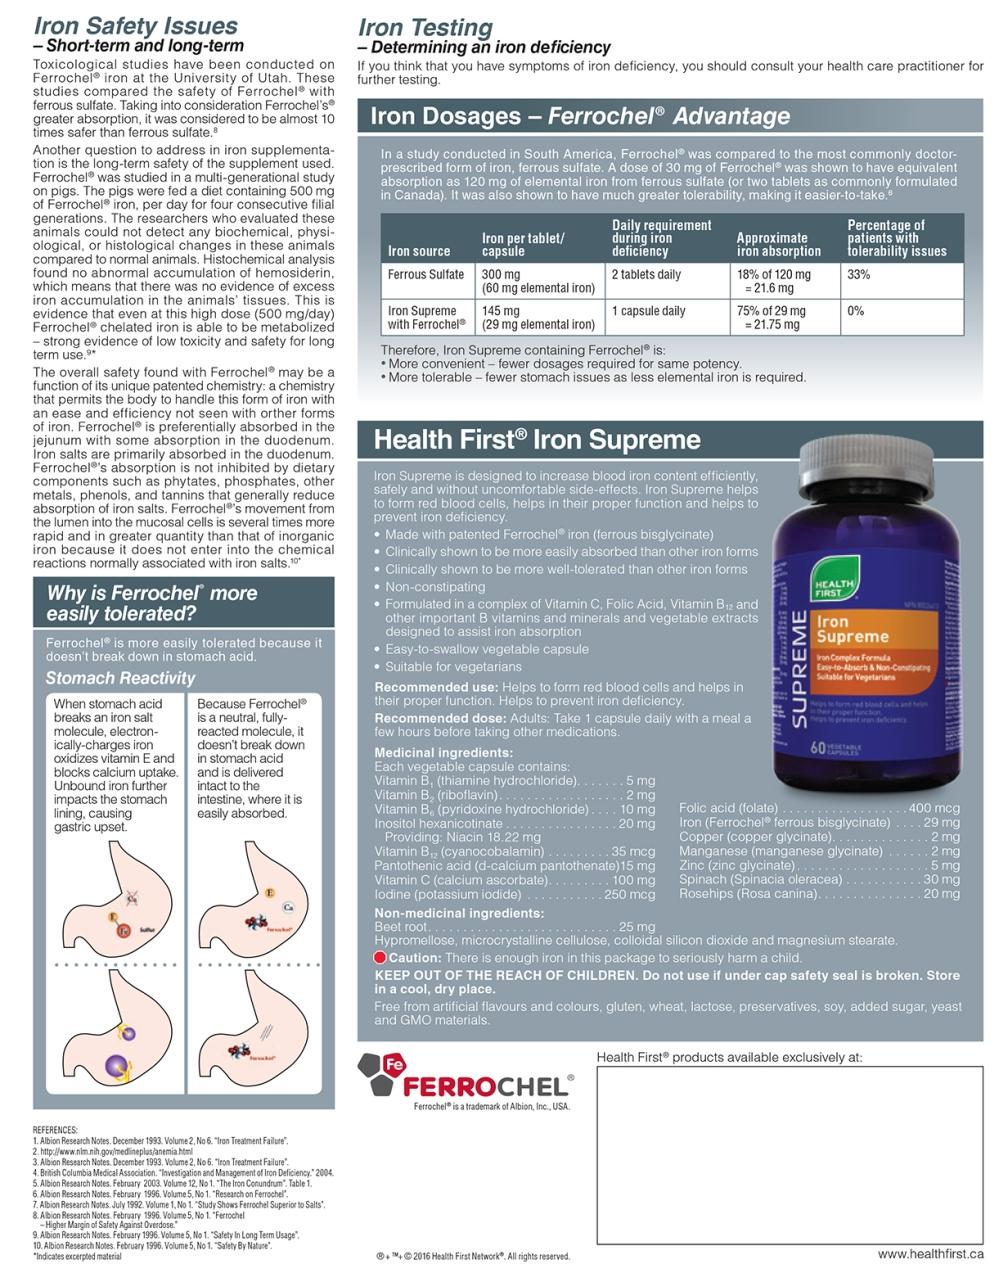 HF Alert 12 (Iron Supreme) ENG - Email-2